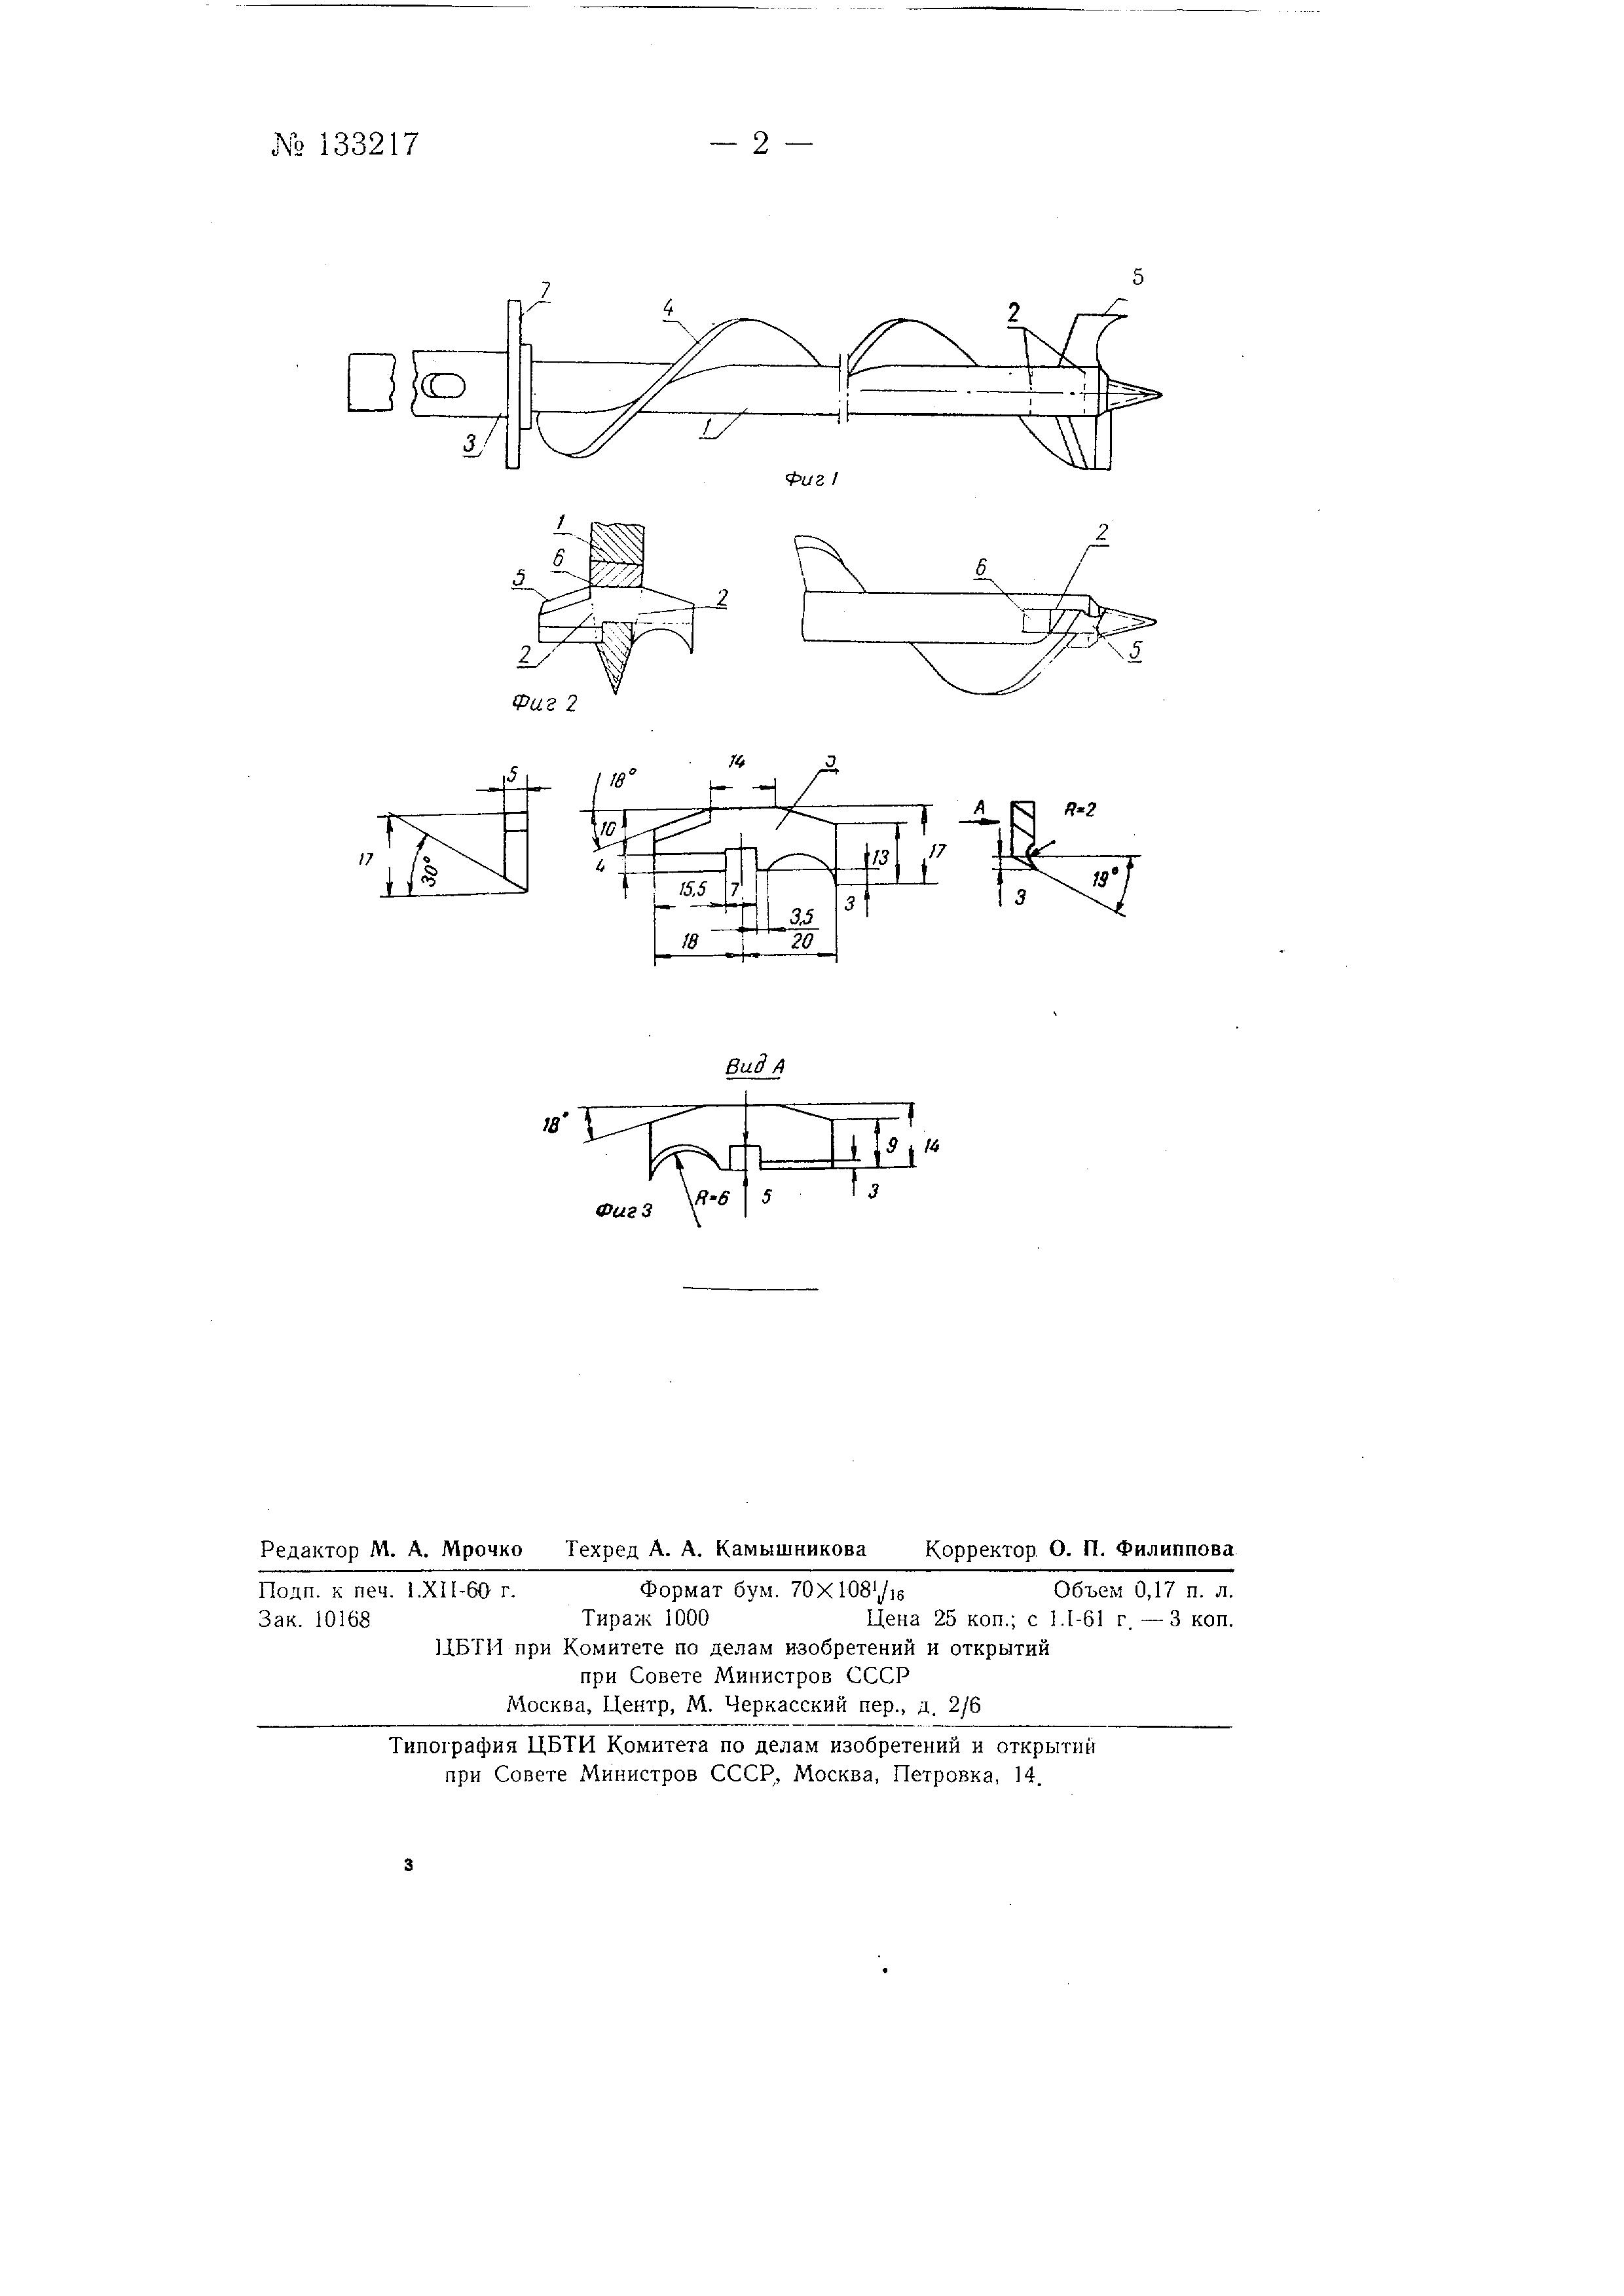 Сверло по дереву шнековое 14 х 230 мм 6-гранный хвостовик Matrix 70104